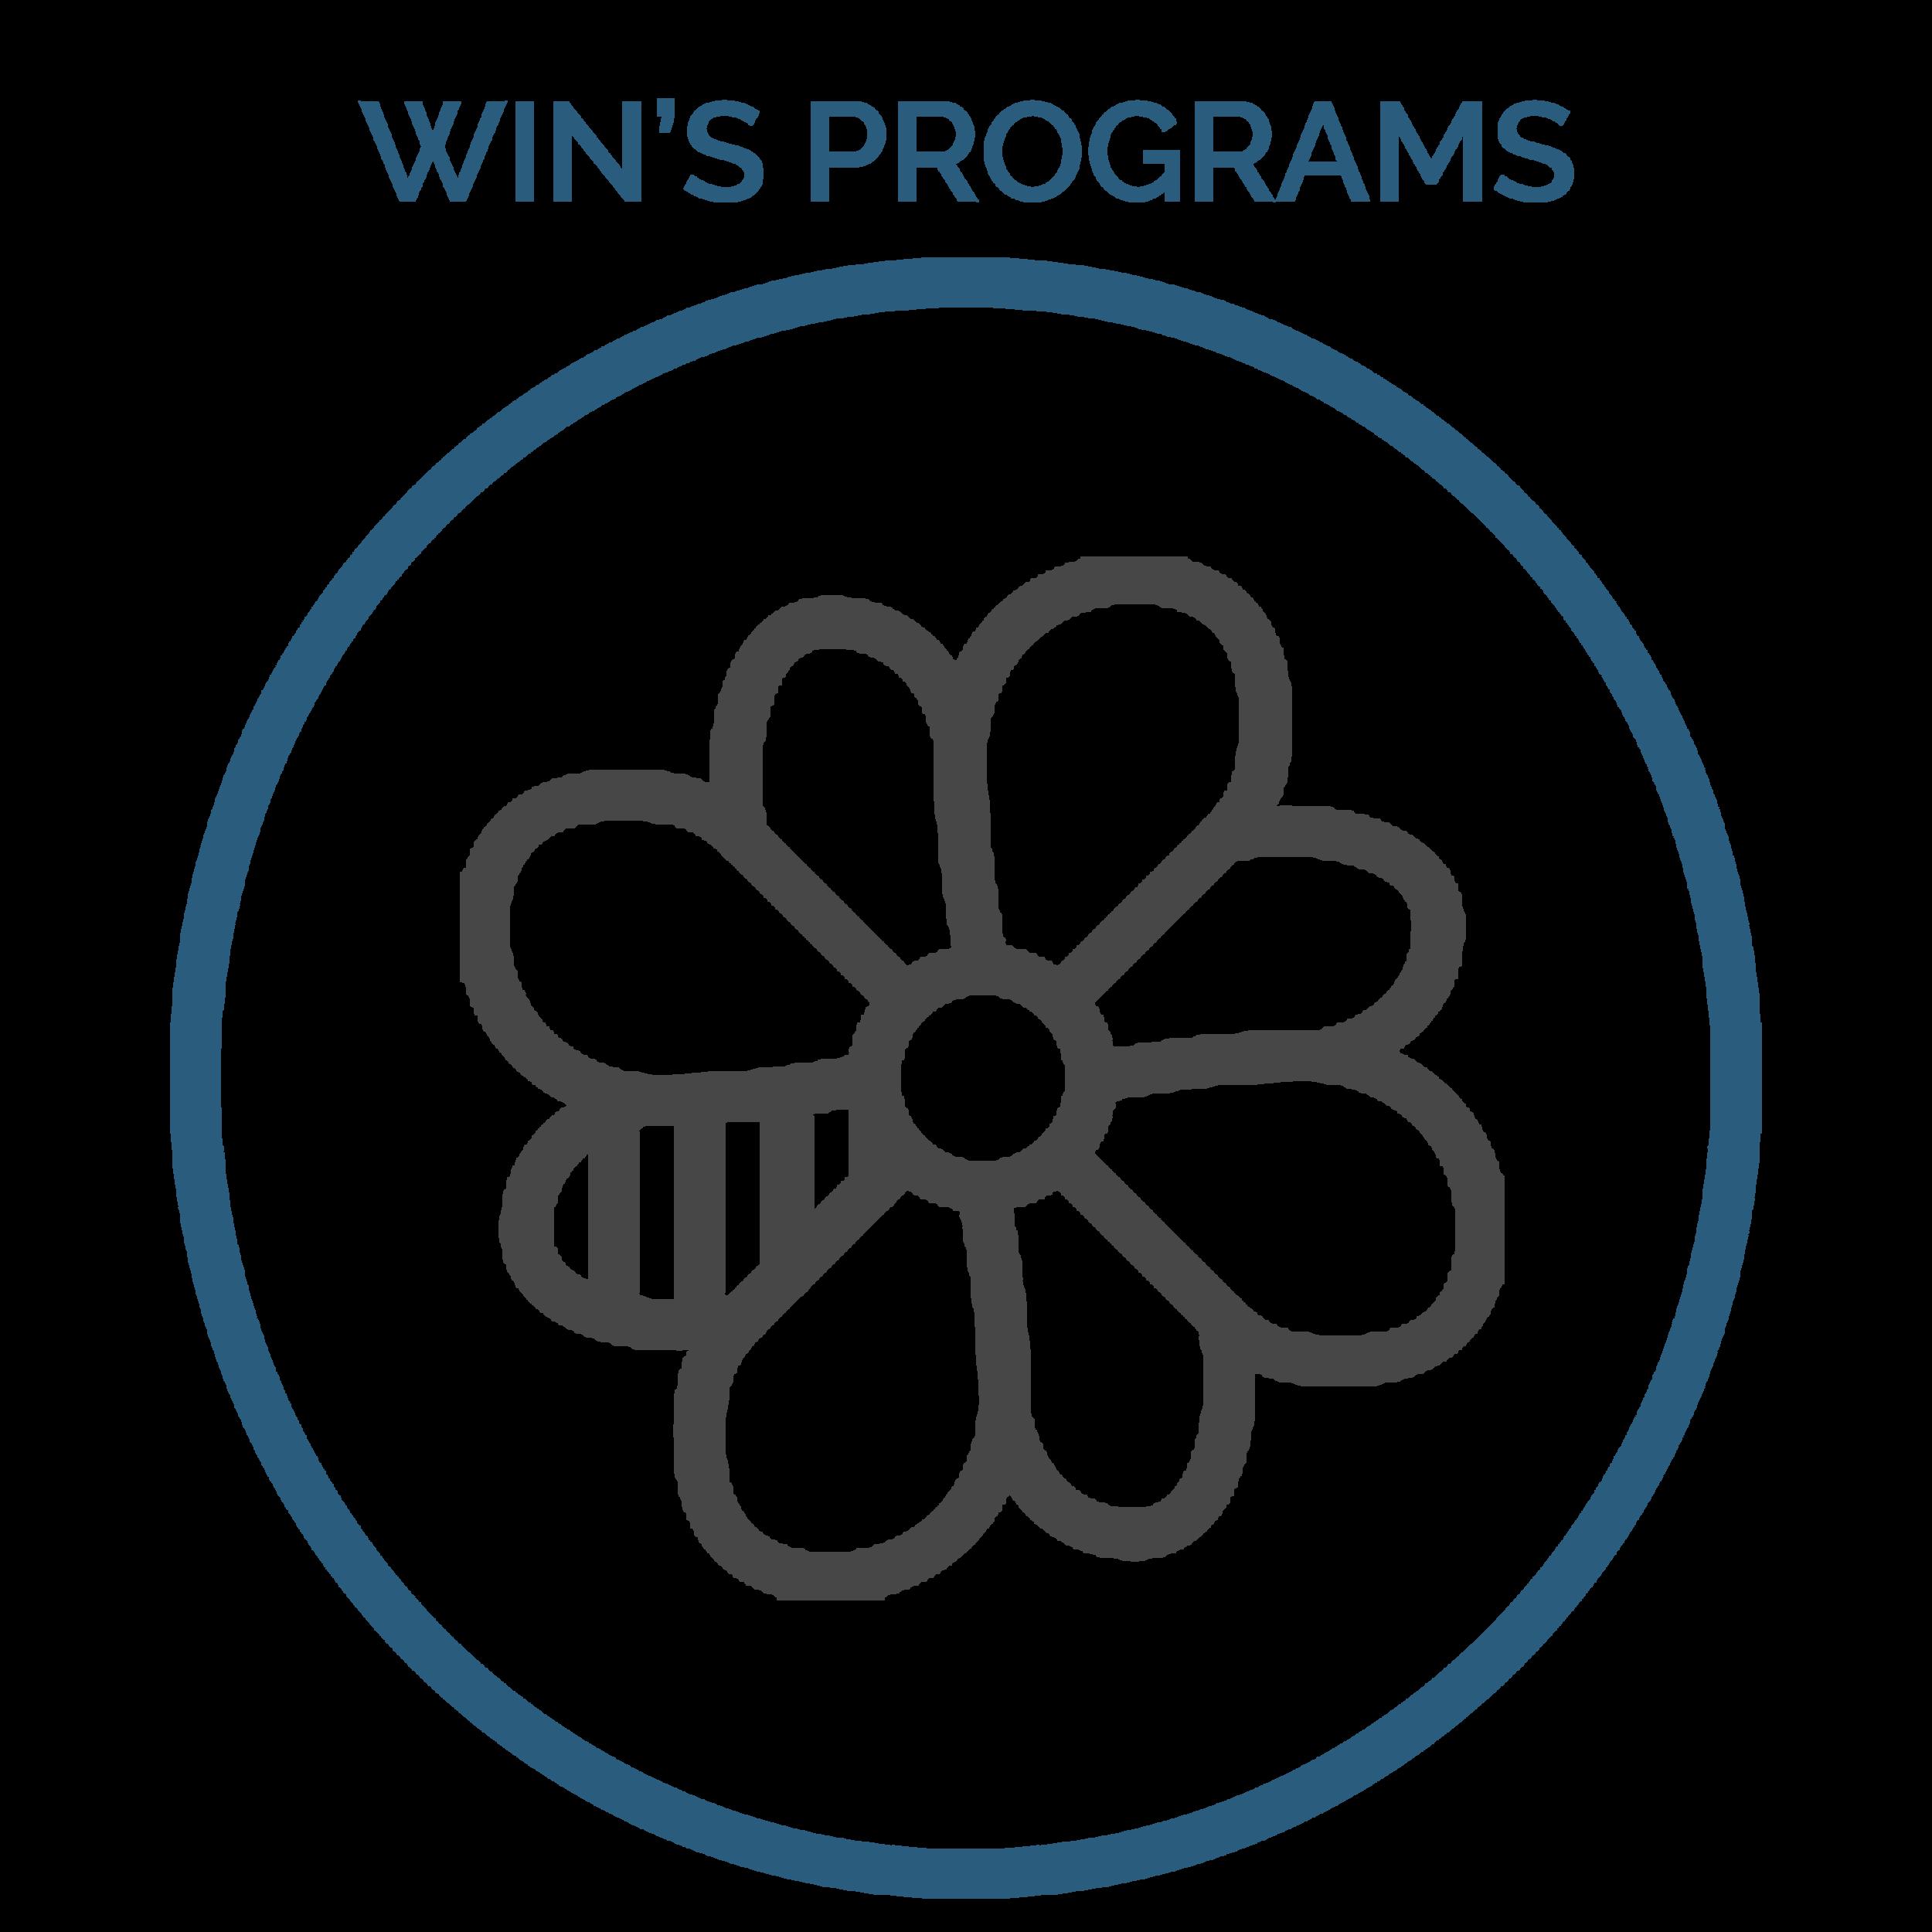 winS PROGRAMS.png